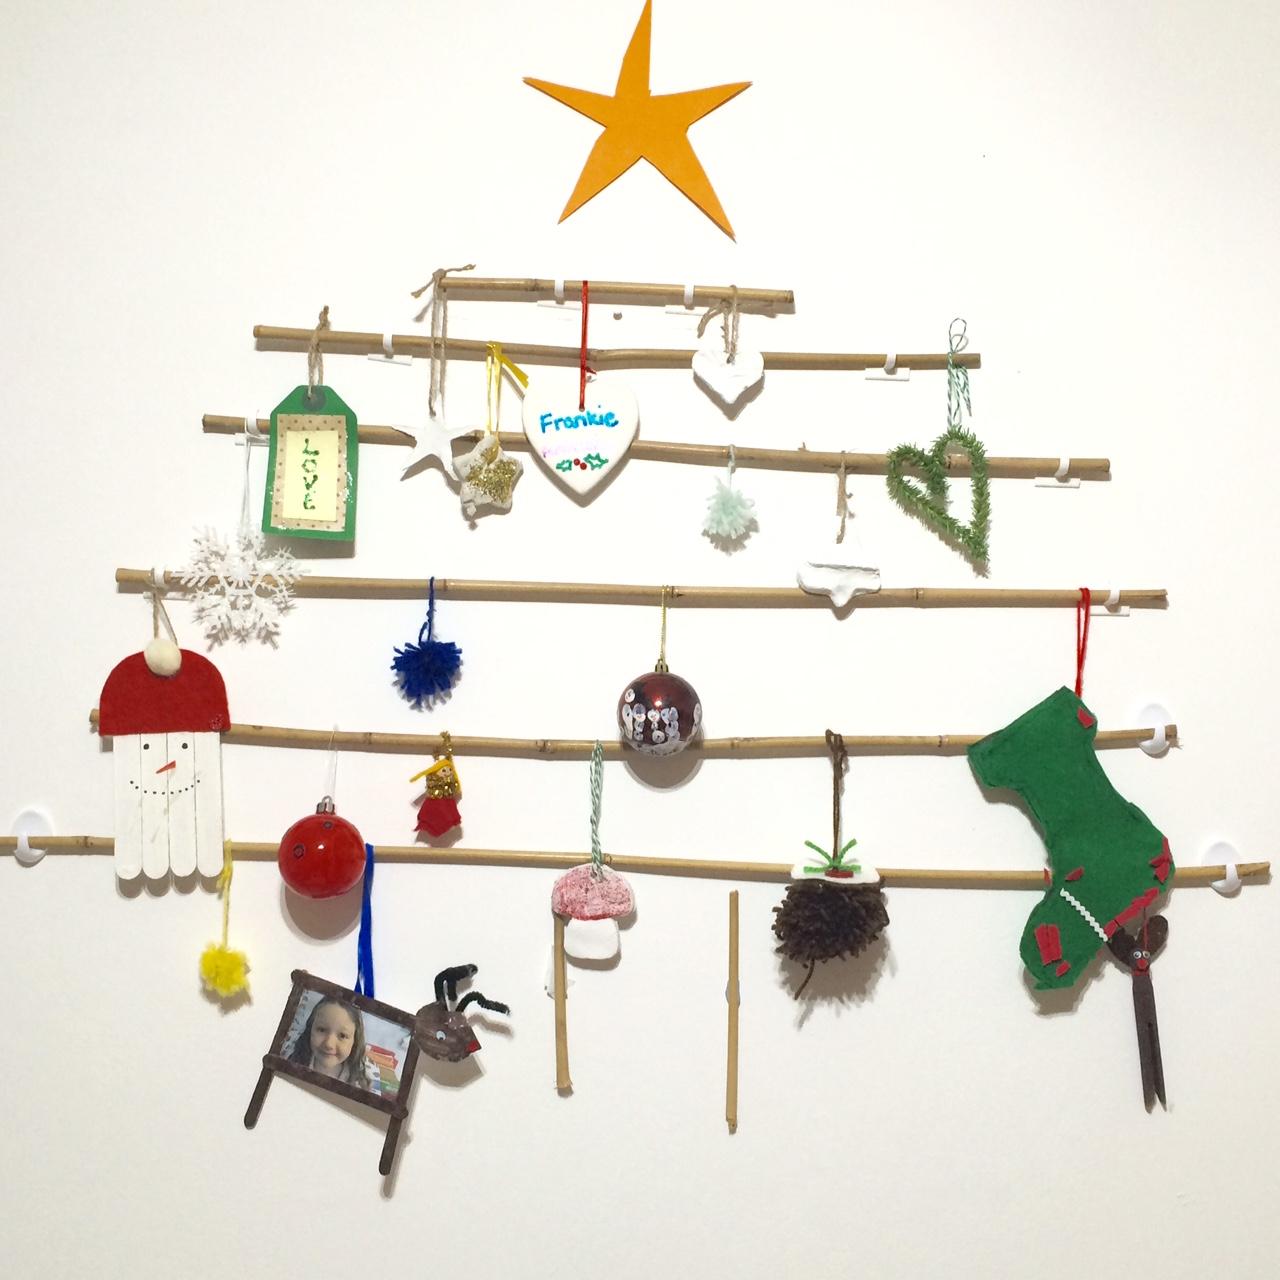 Our Homemade Christmas Tree